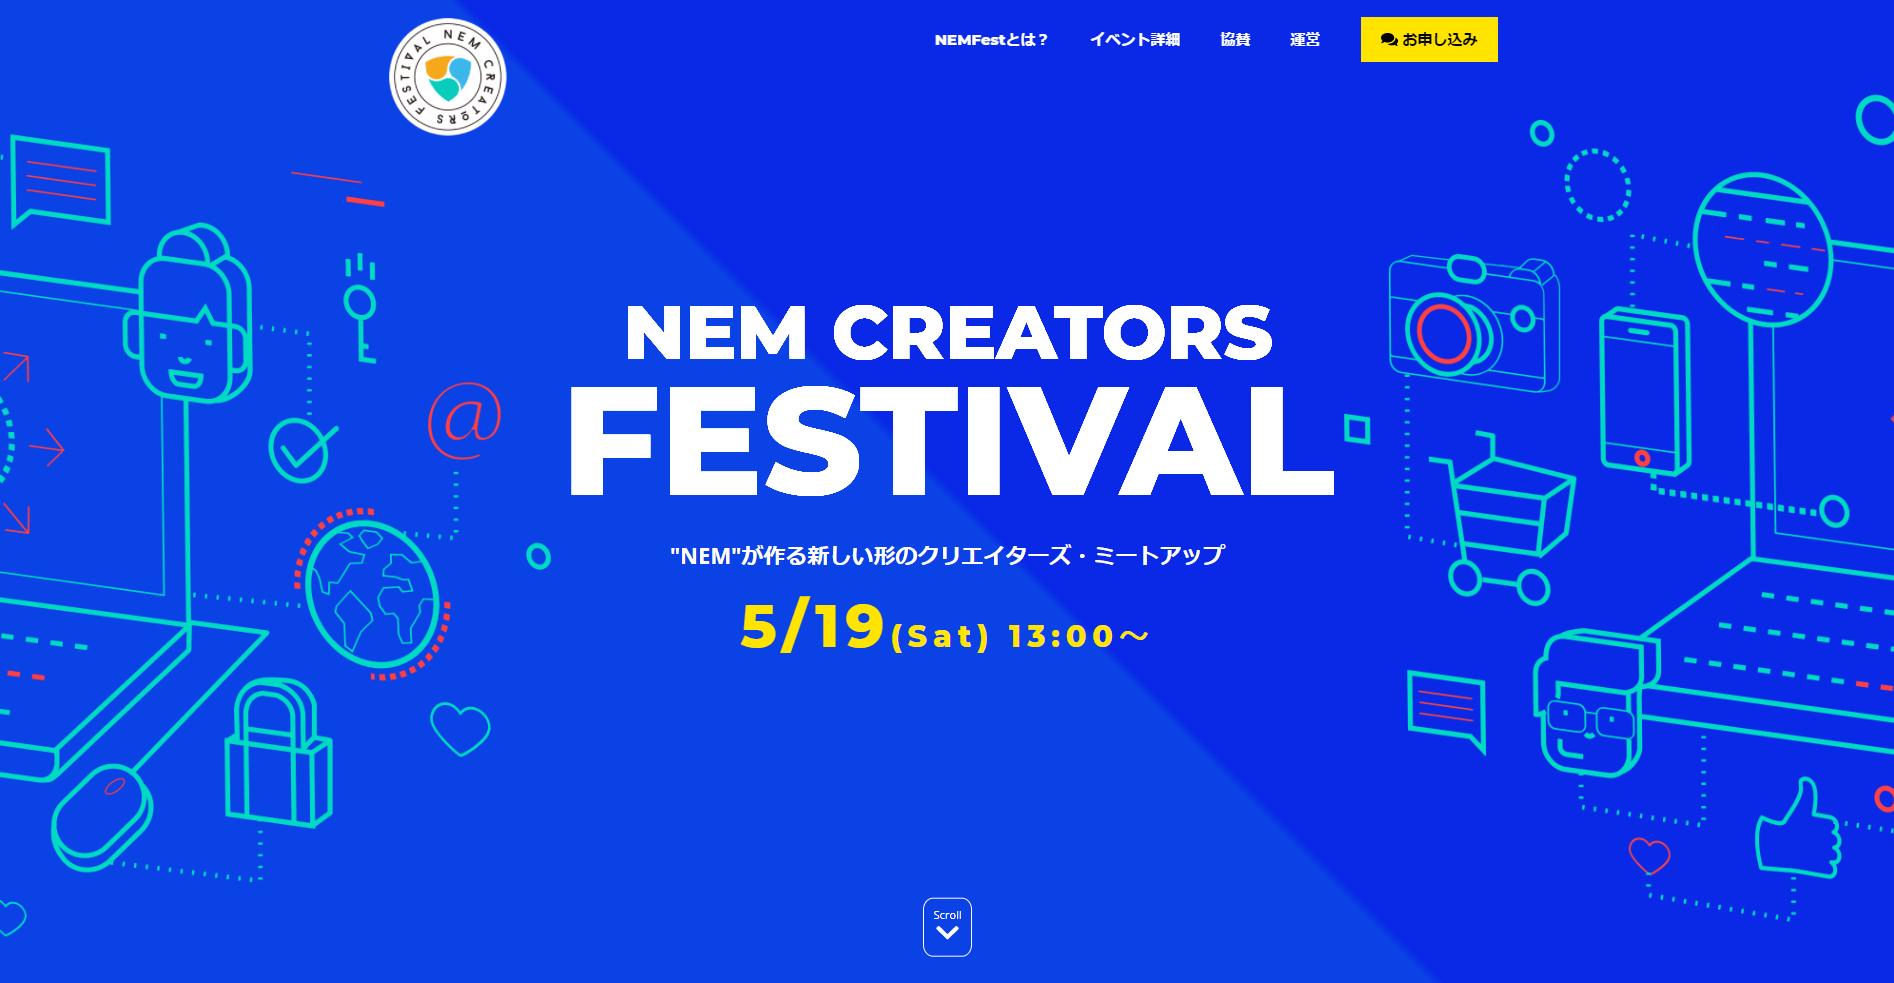 NEM開発者向けイベント「NEM CREATORS FESTIVAL」開催